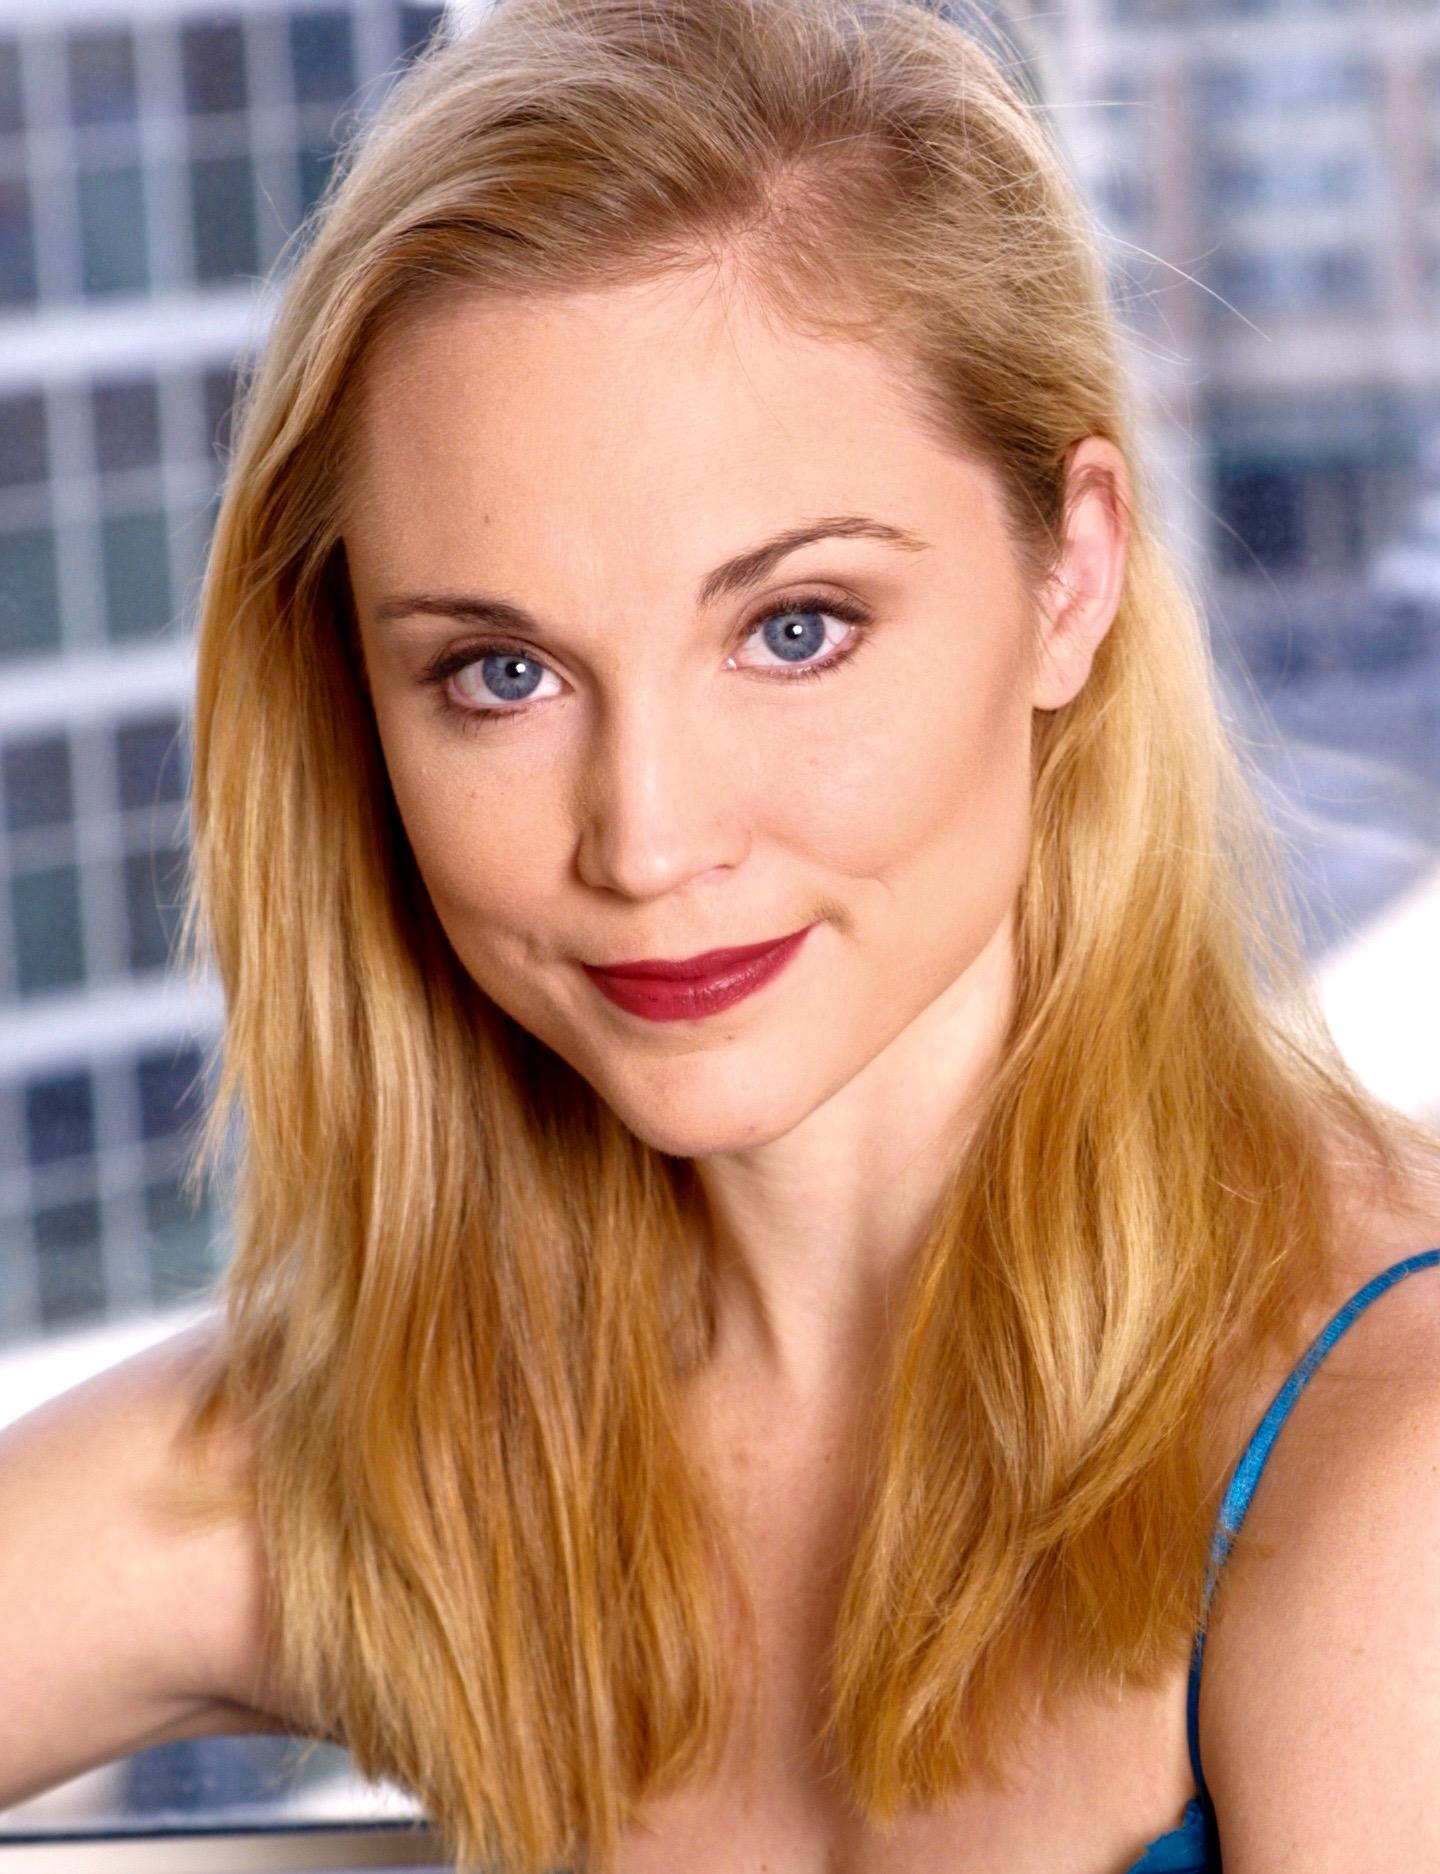 Allison Baber